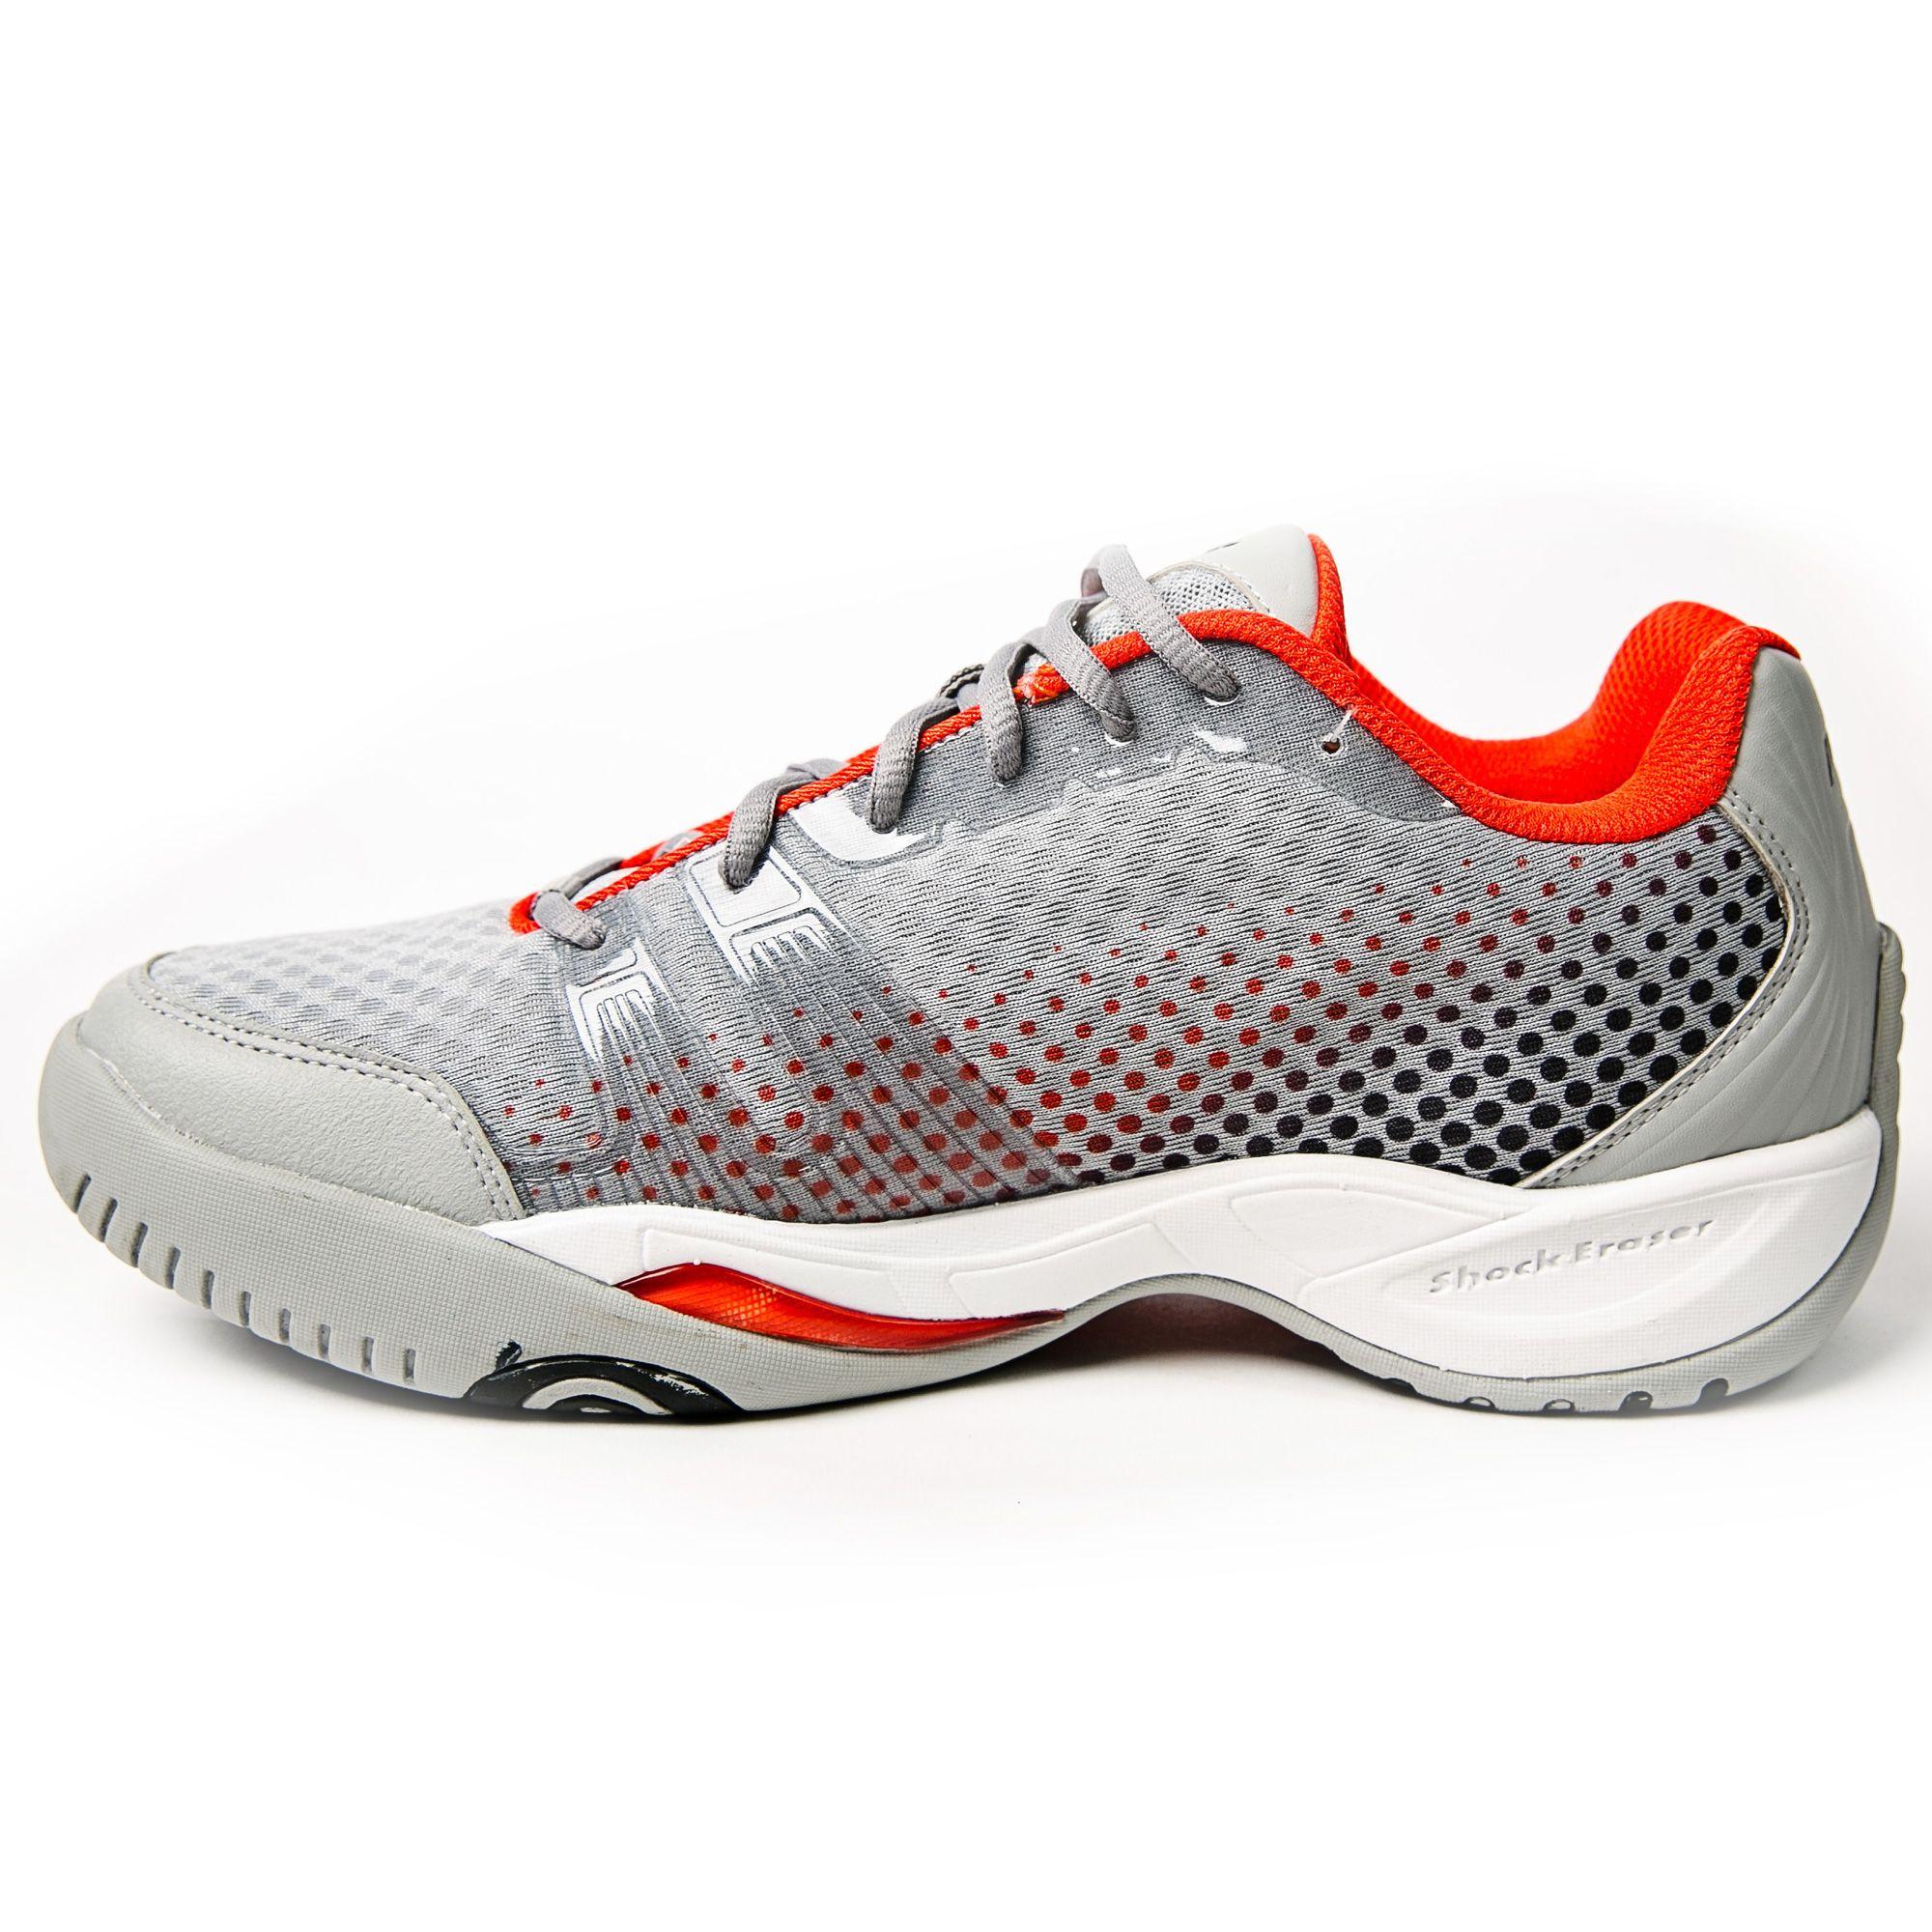 prince t22 lite mens tennis shoes